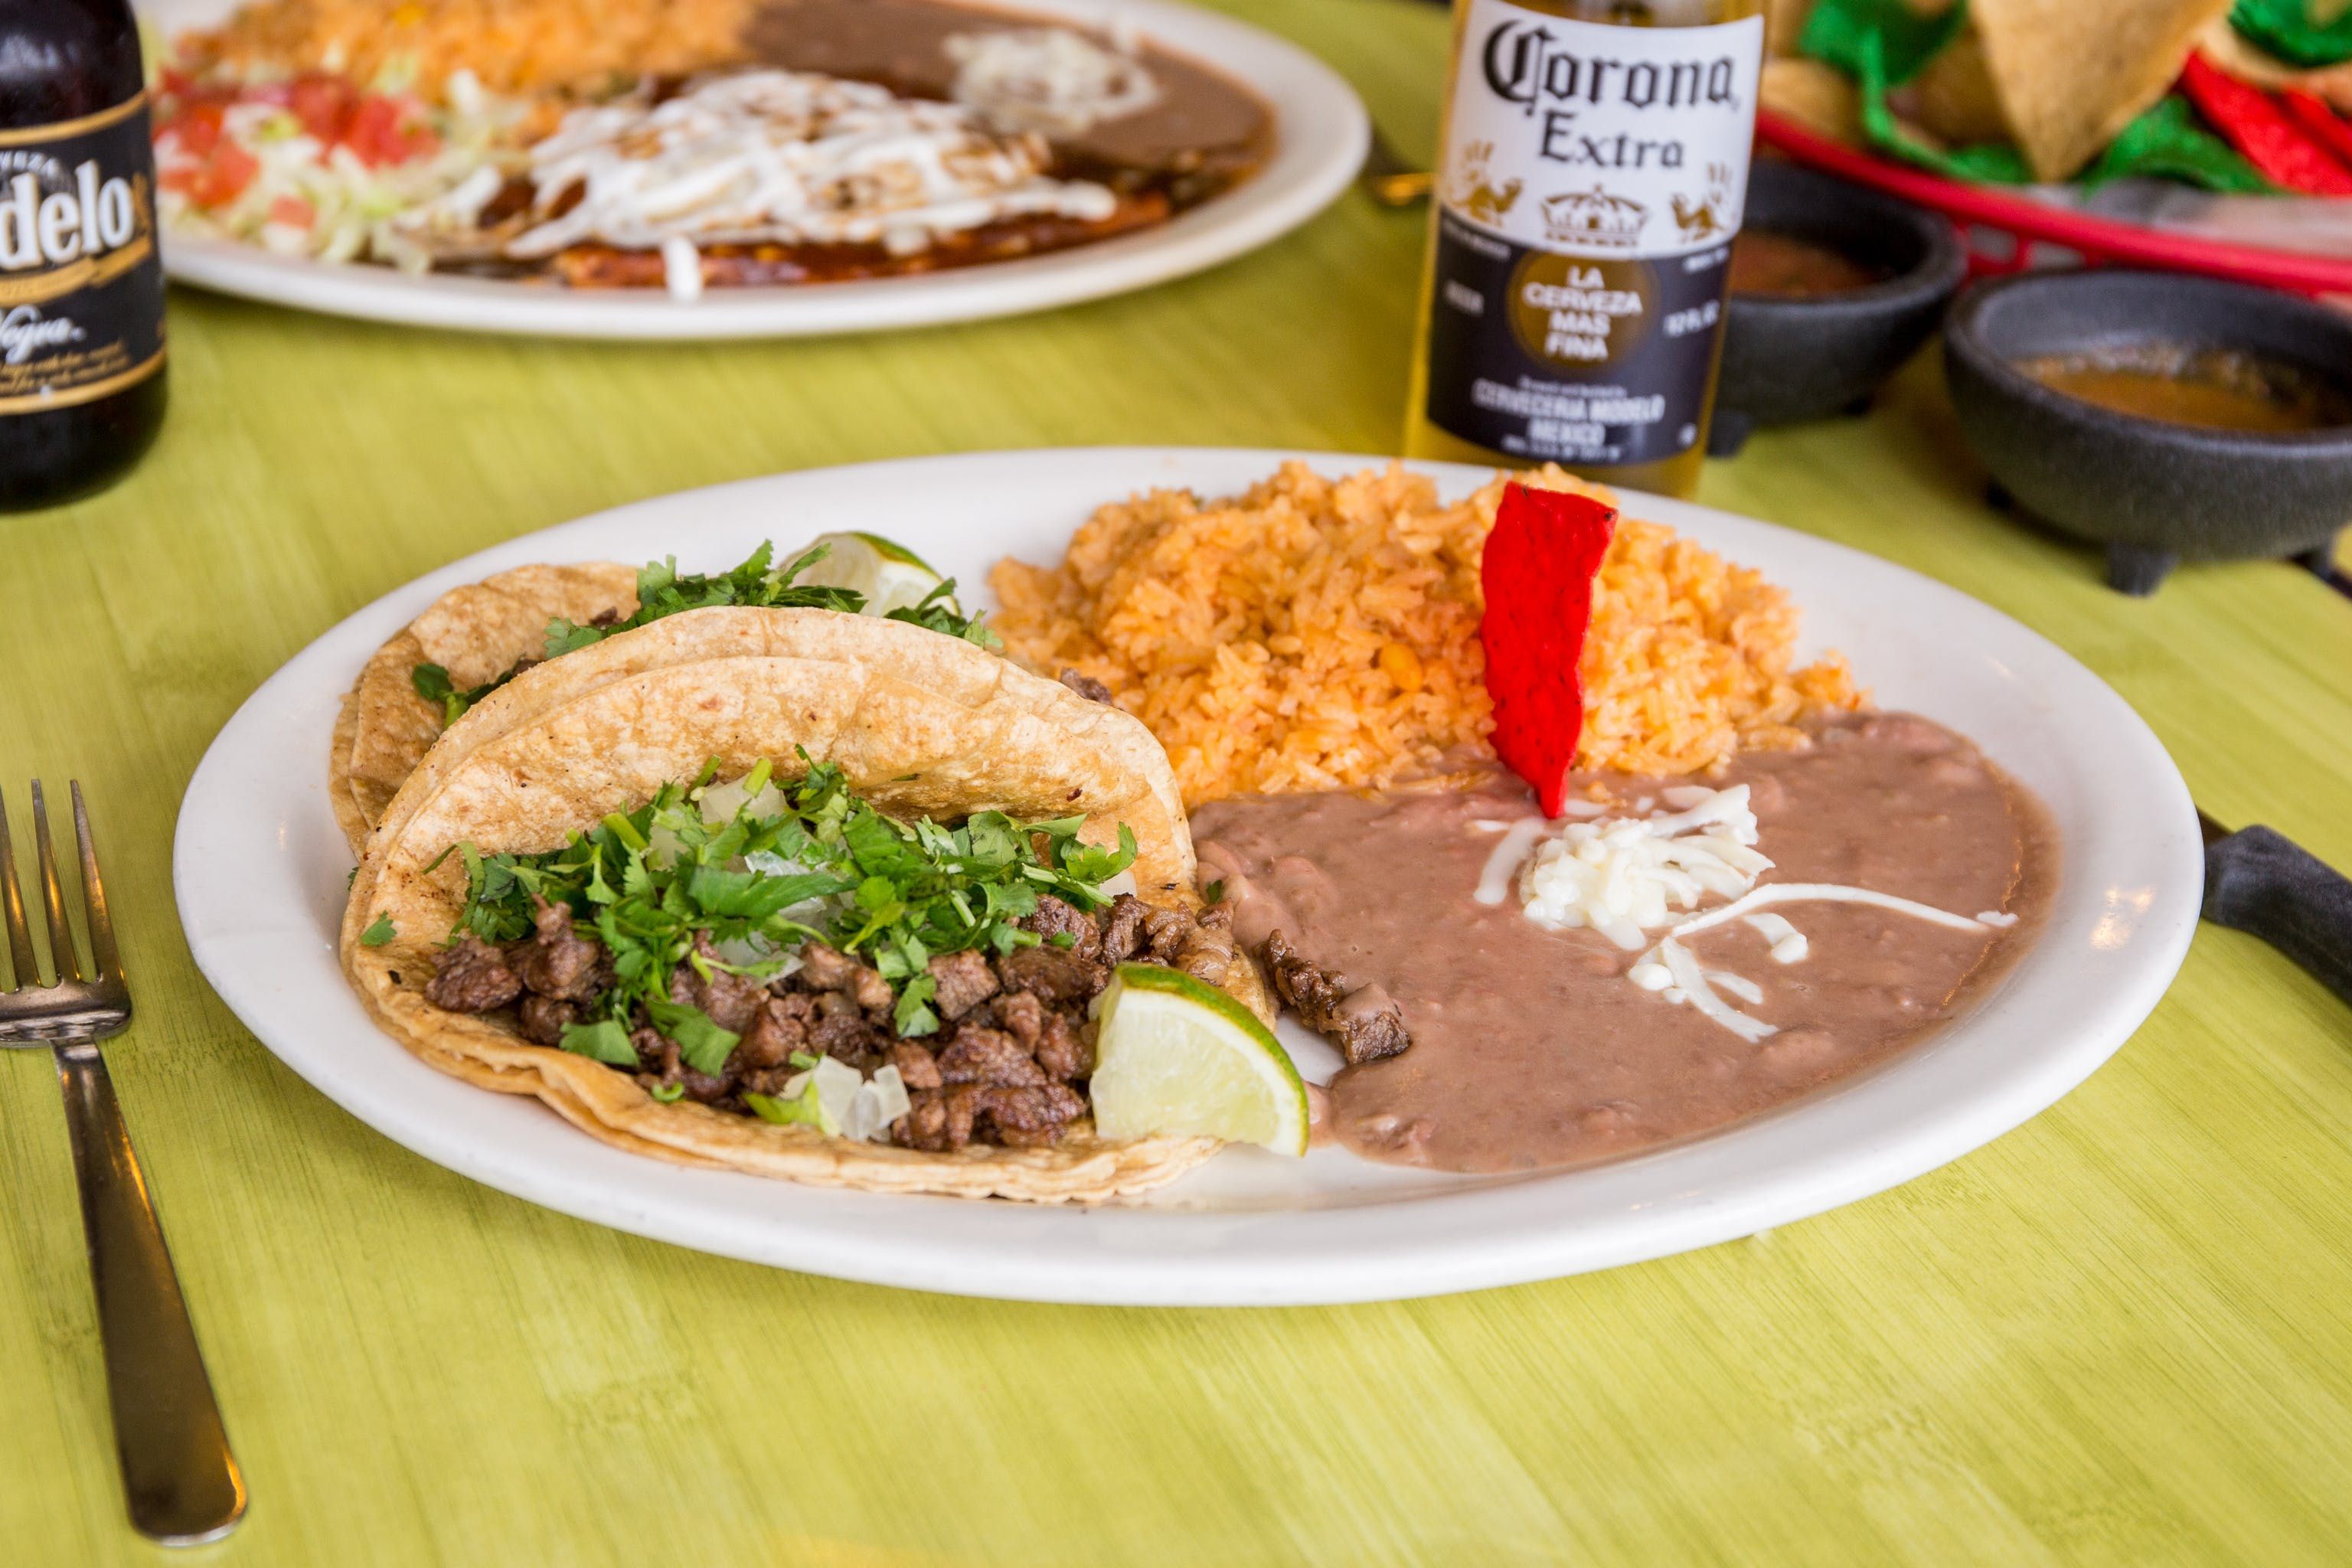 Taco Dinner from Taqueria Guadalajara in Madison, WI